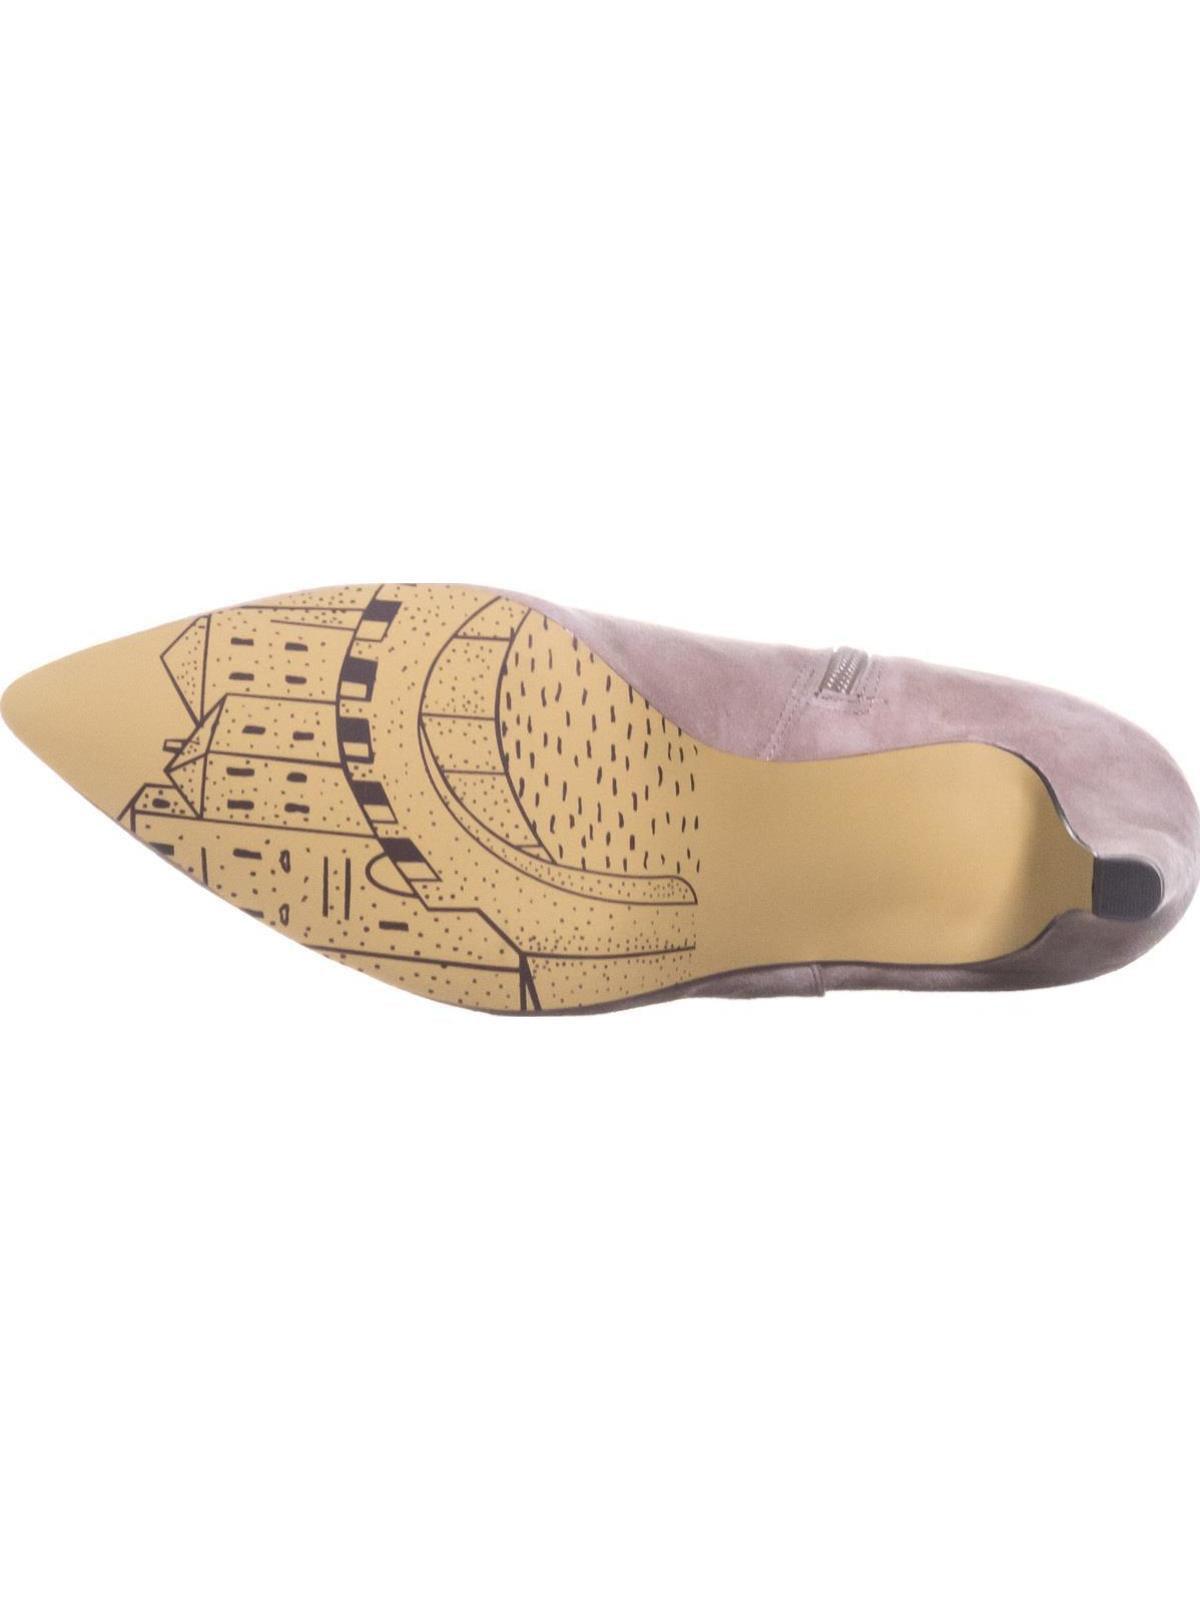 Womens Bella Vita 9.5 Delfina Ankle Booties, Almond Suede, 9.5 Vita W US 058287